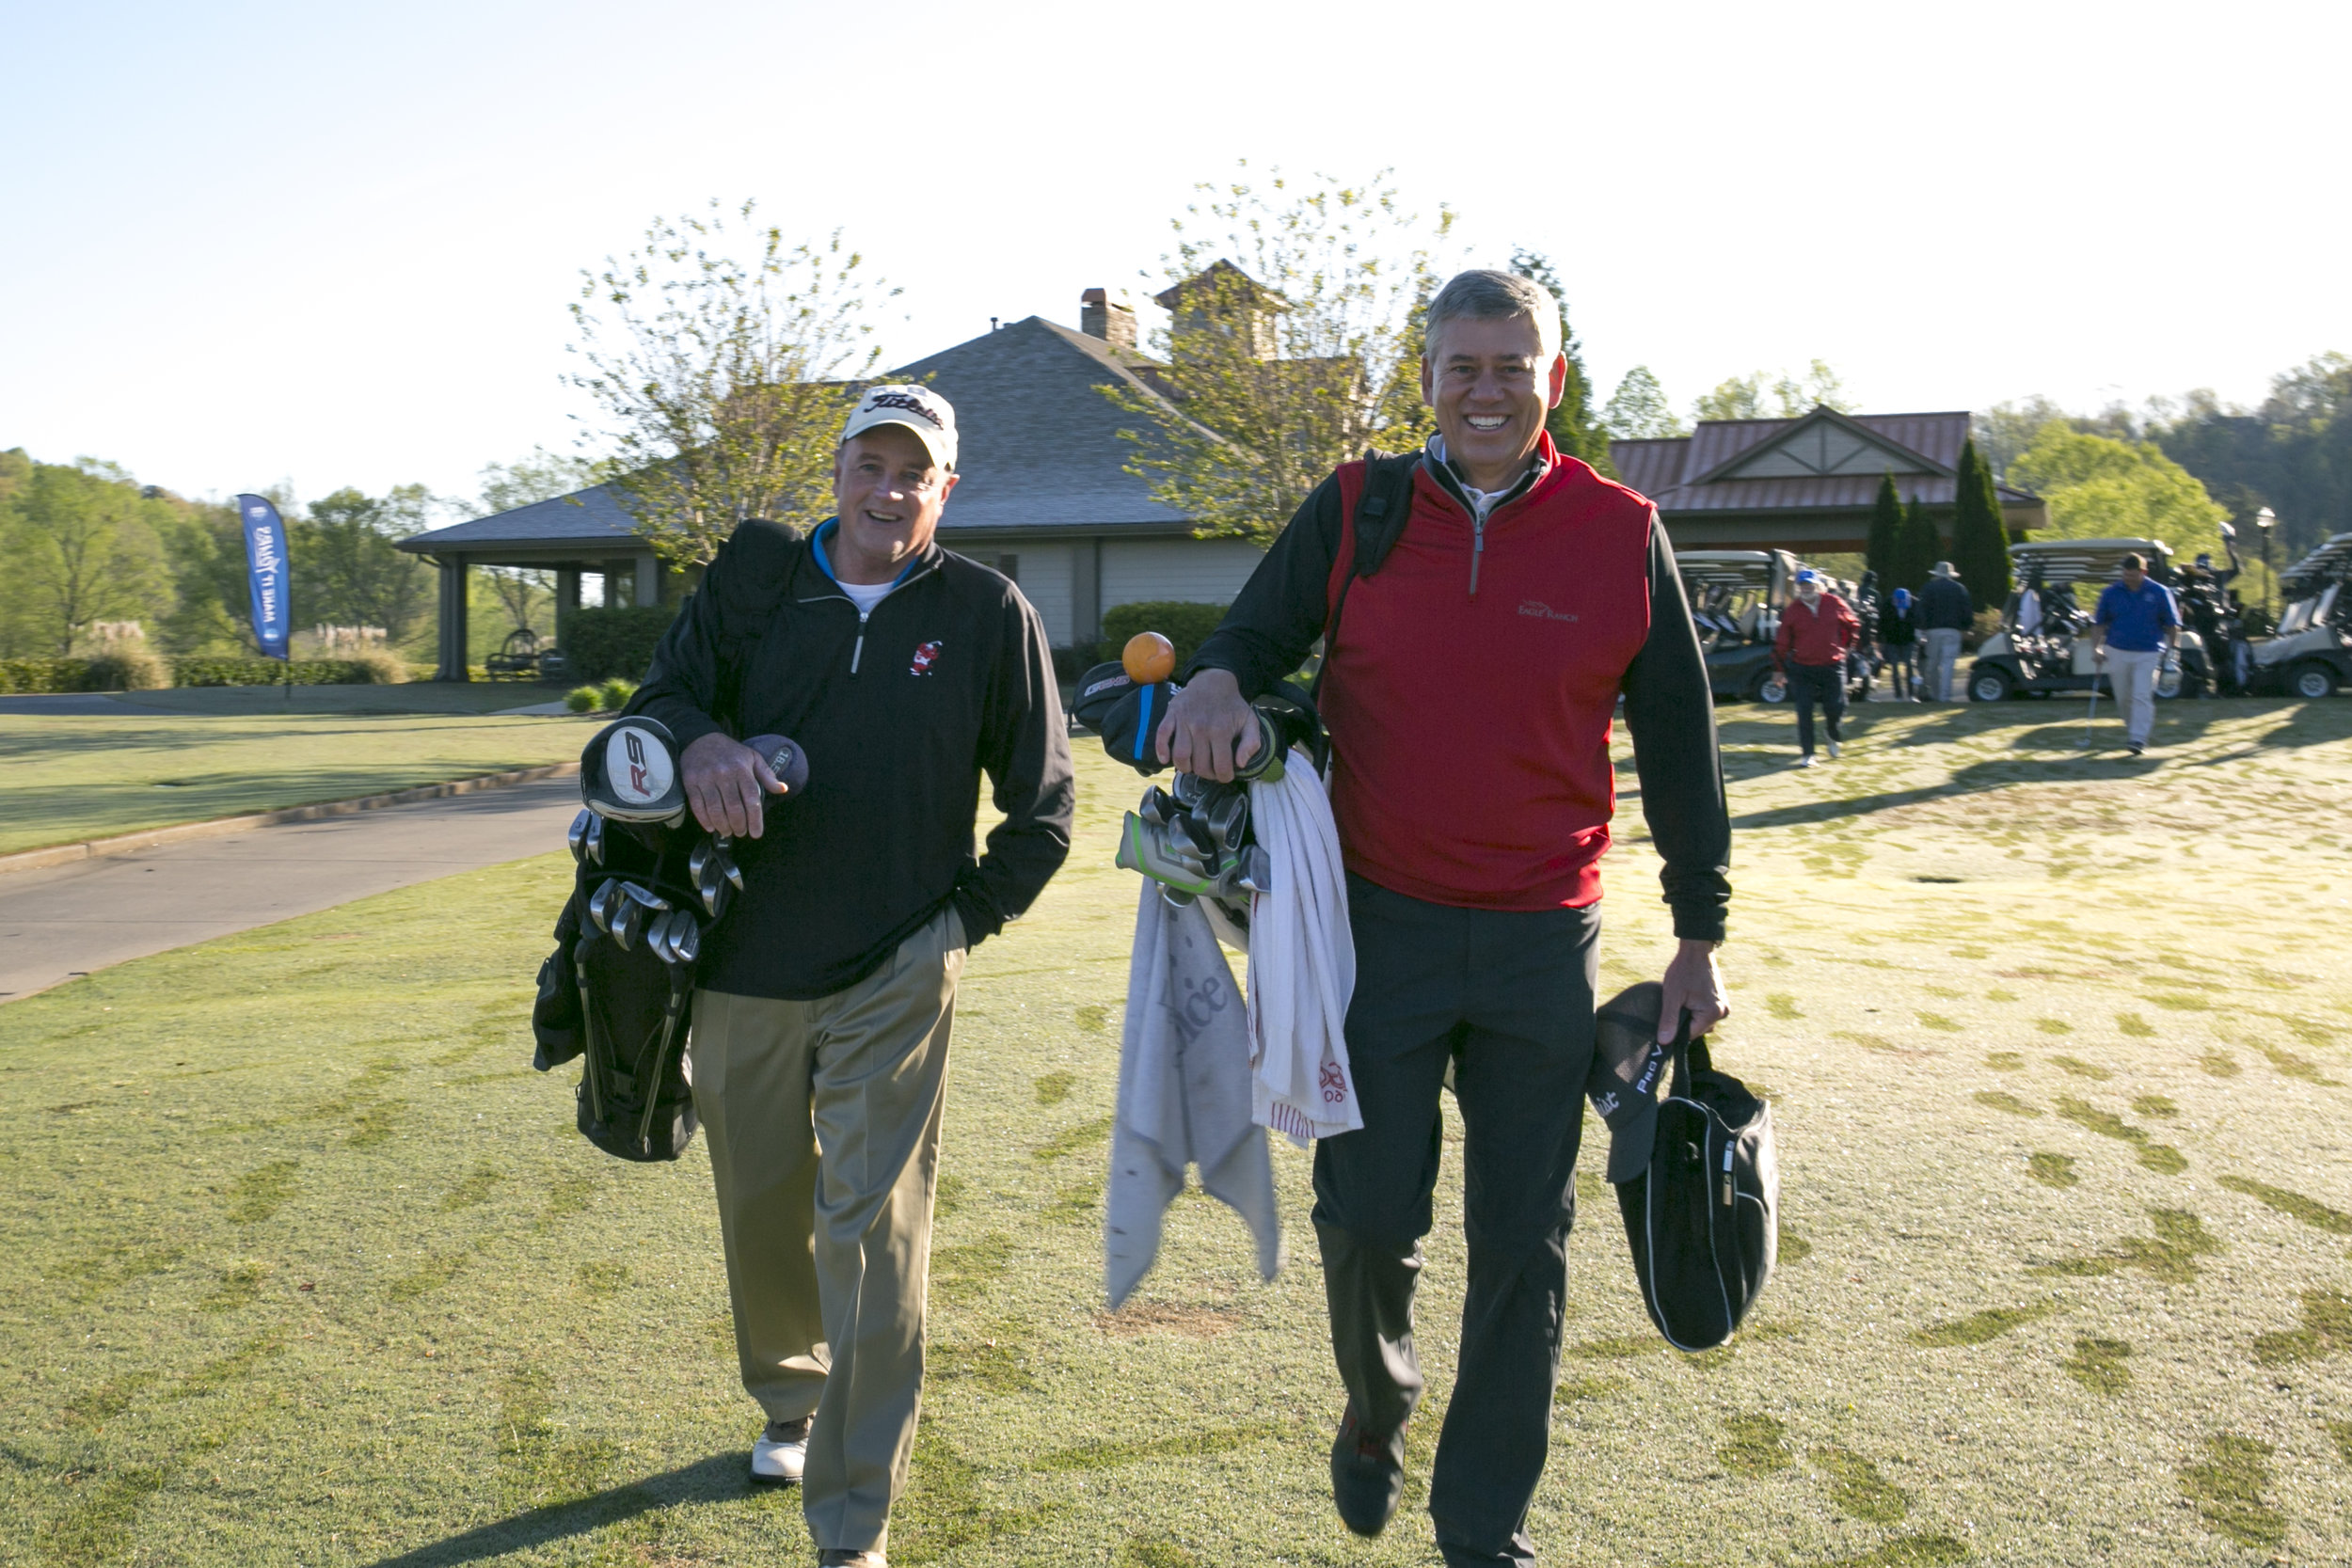 180420-aw-golf-1035.jpg